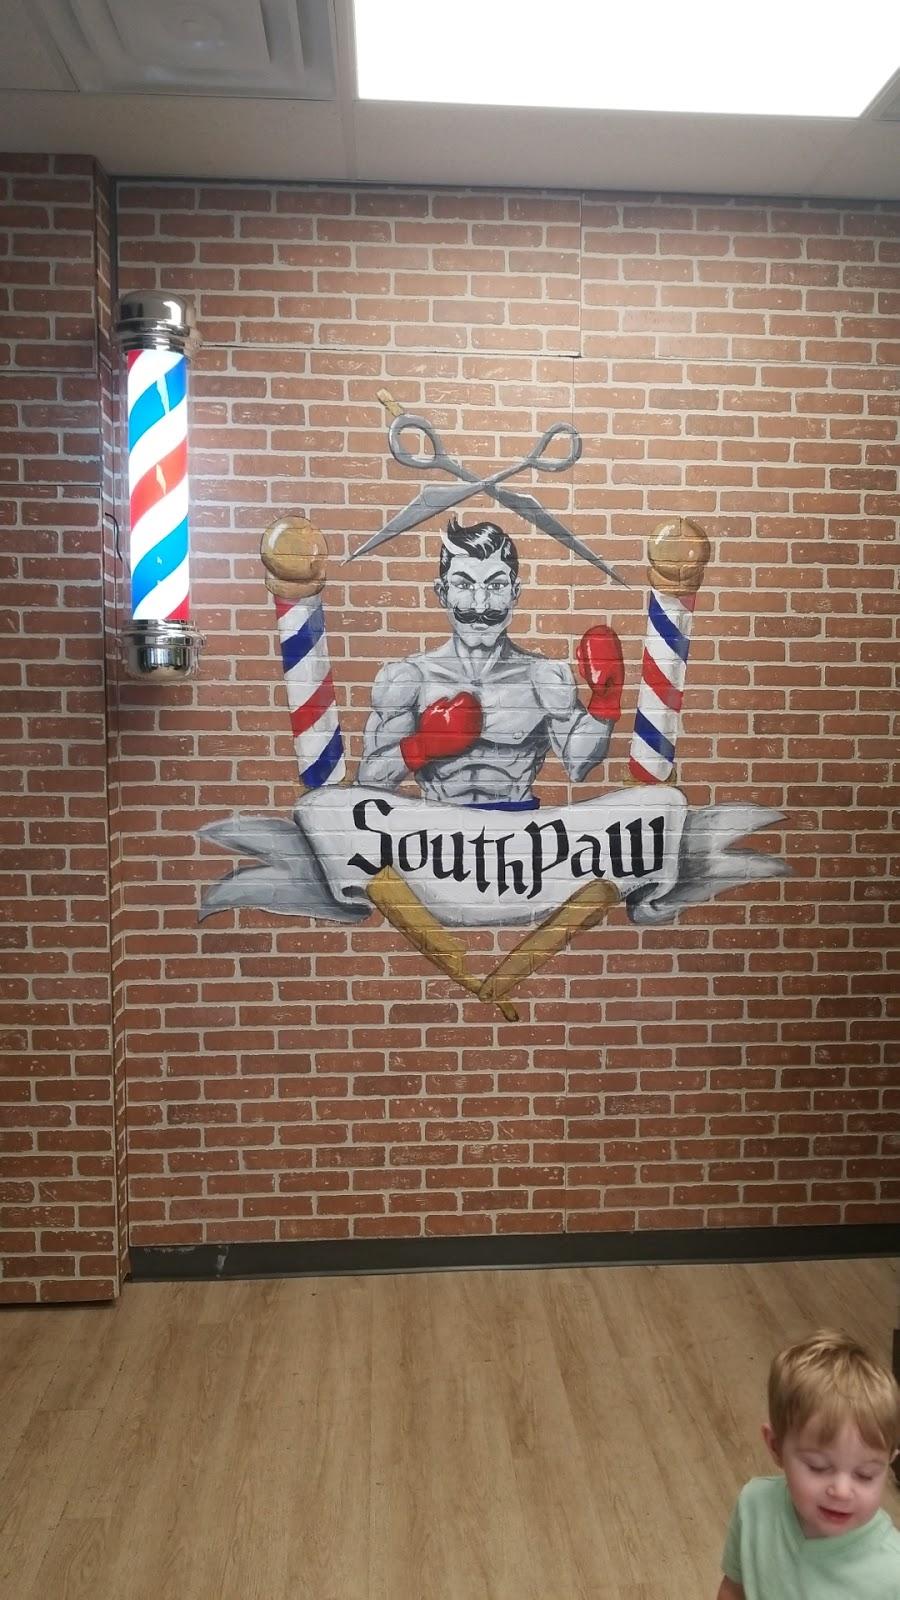 SouthPaw Barbers   hair care   800 King St W, Oshawa, ON L1J 2L5, Canada   9055717299 OR +1 905-571-7299